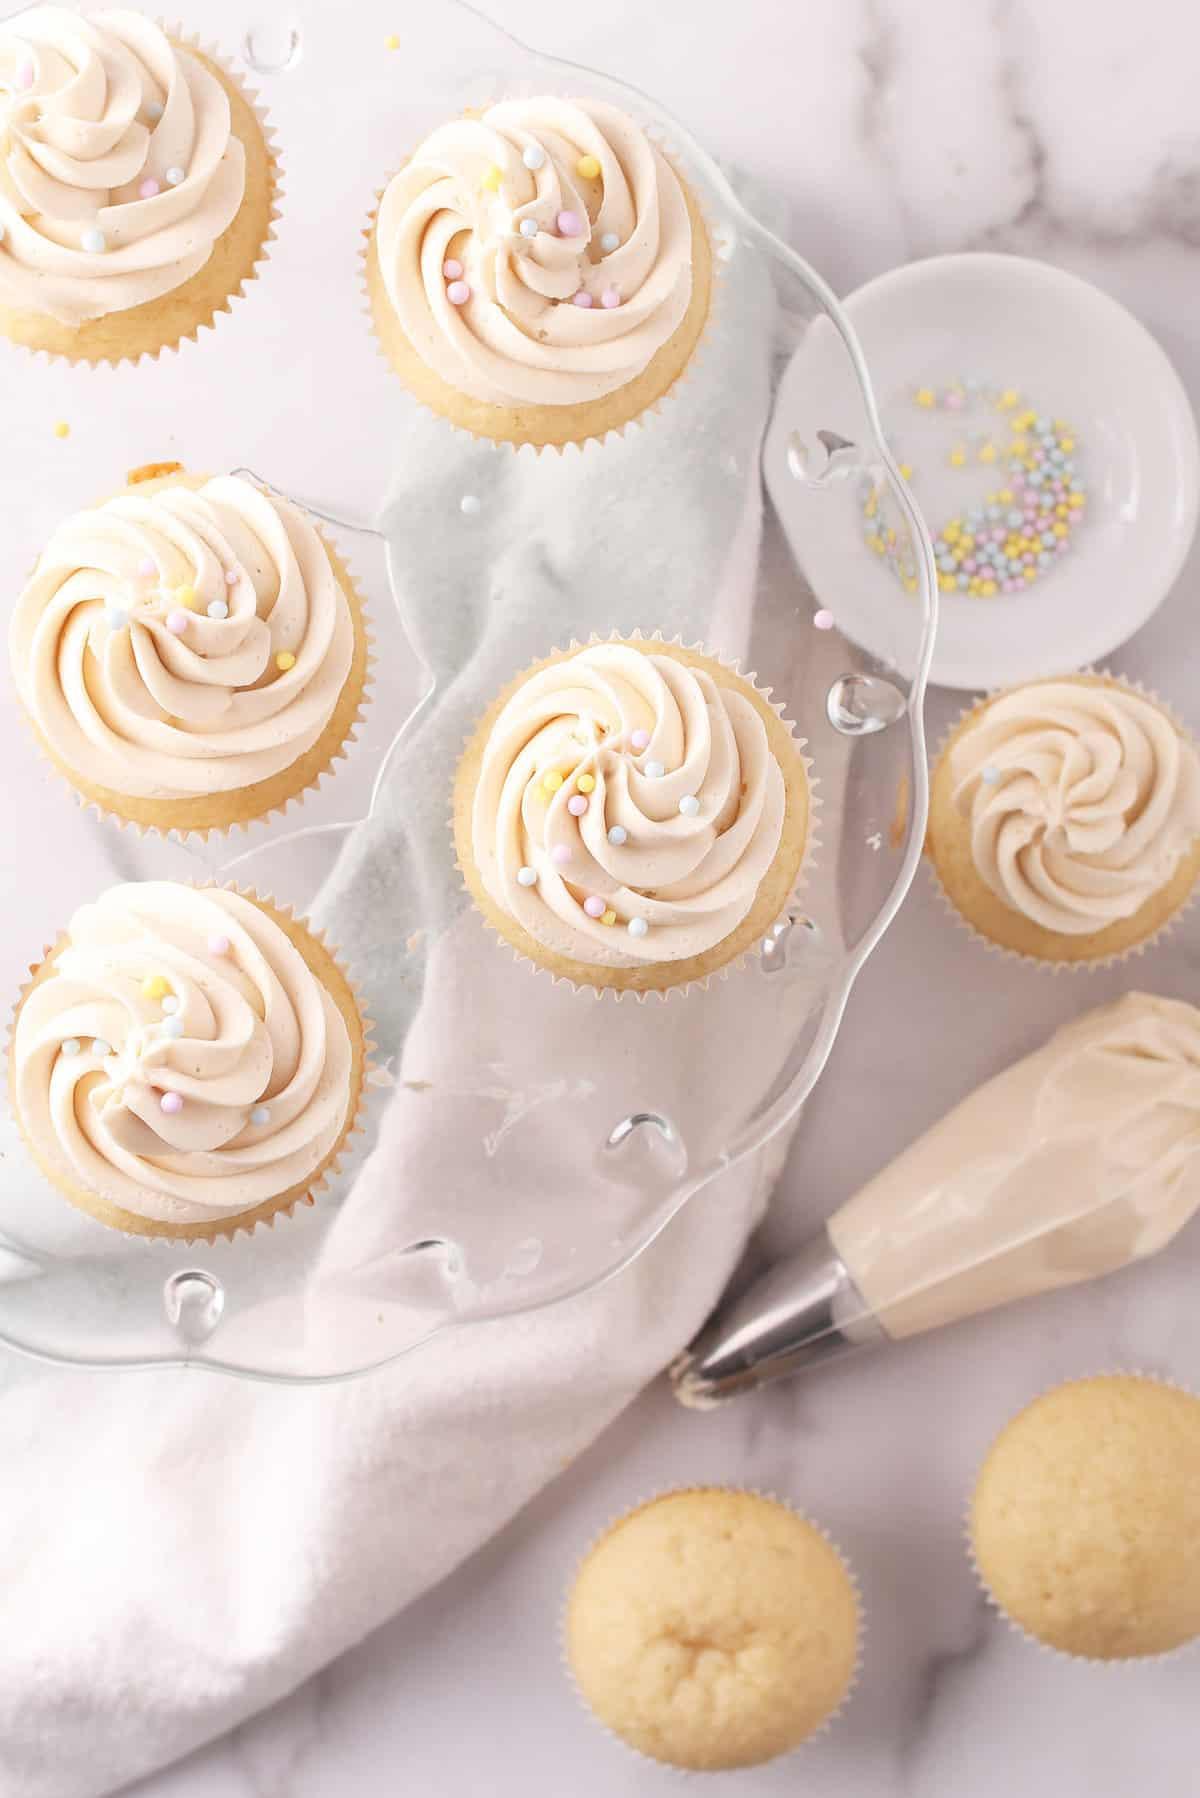 Vegan Vanilla Cupcakes on cake stand